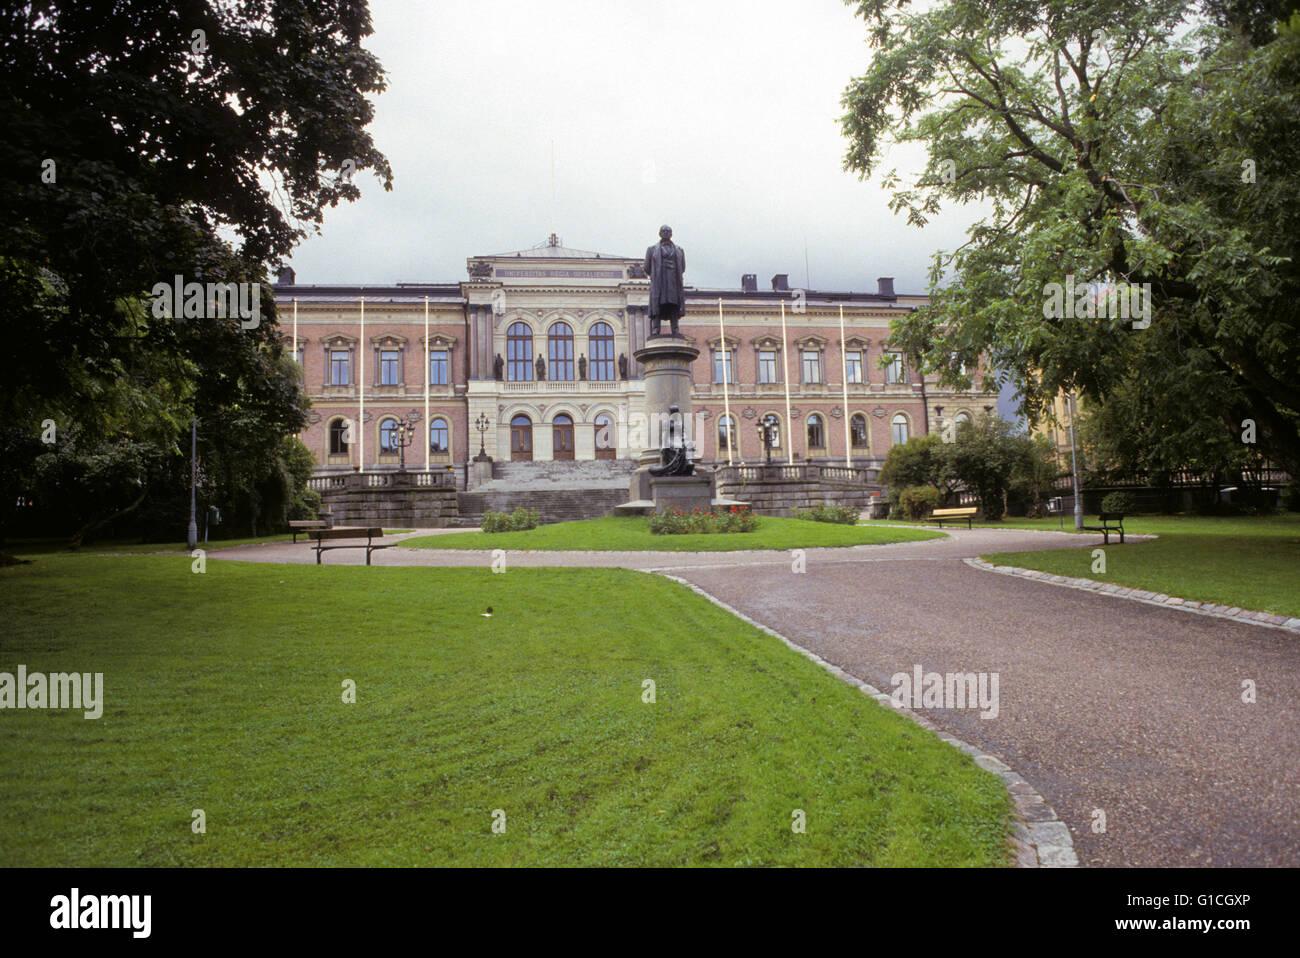 Uppsal University oldest teachings seat in Sweden - Stock Image